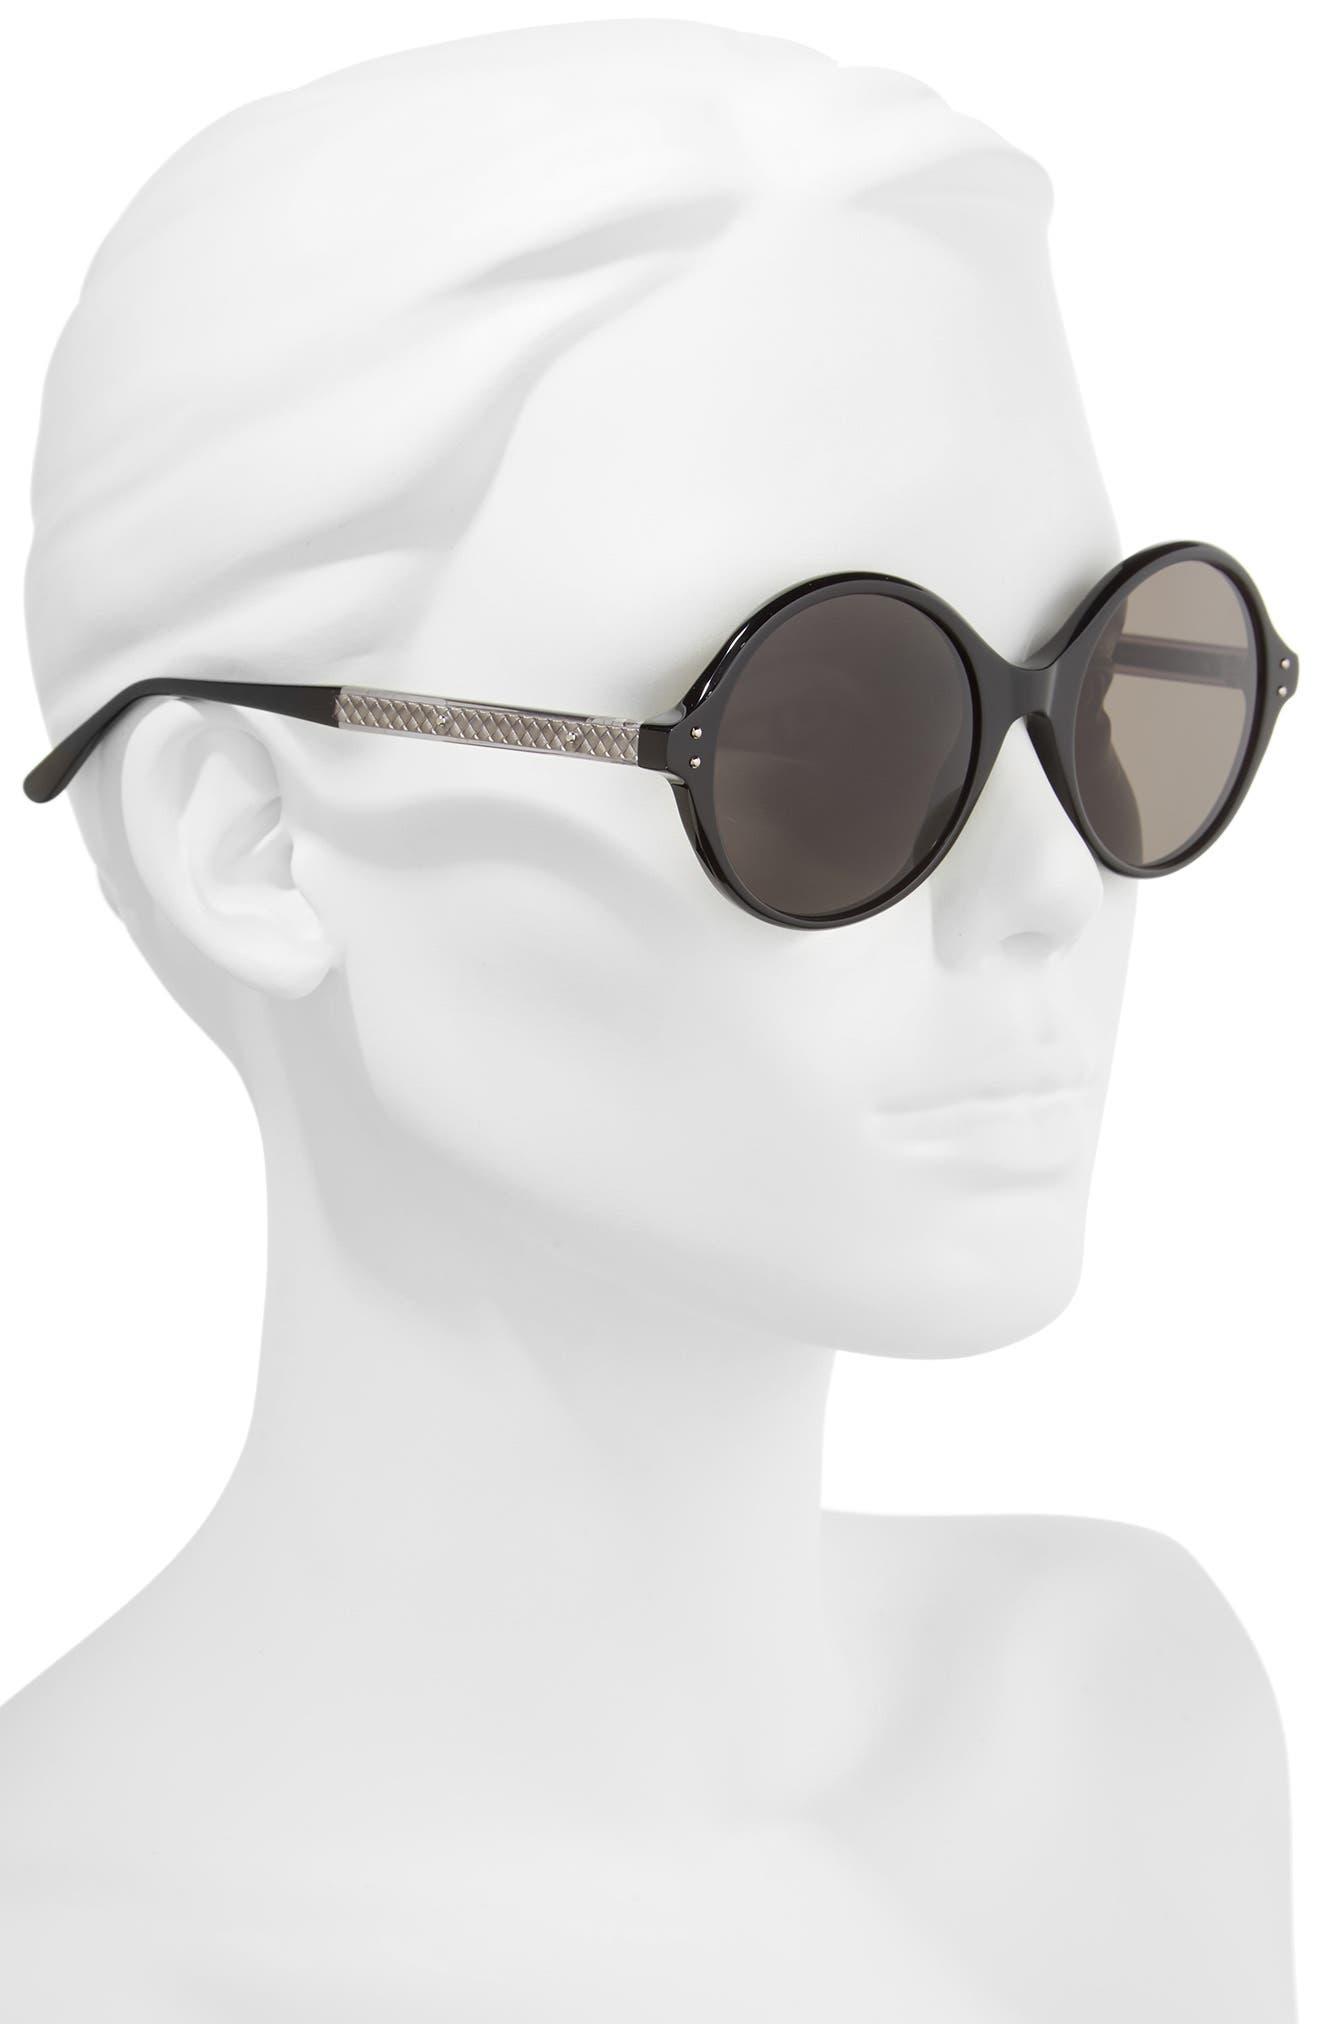 52mm Round Sunglasses,                             Alternate thumbnail 2, color,                             BLACK